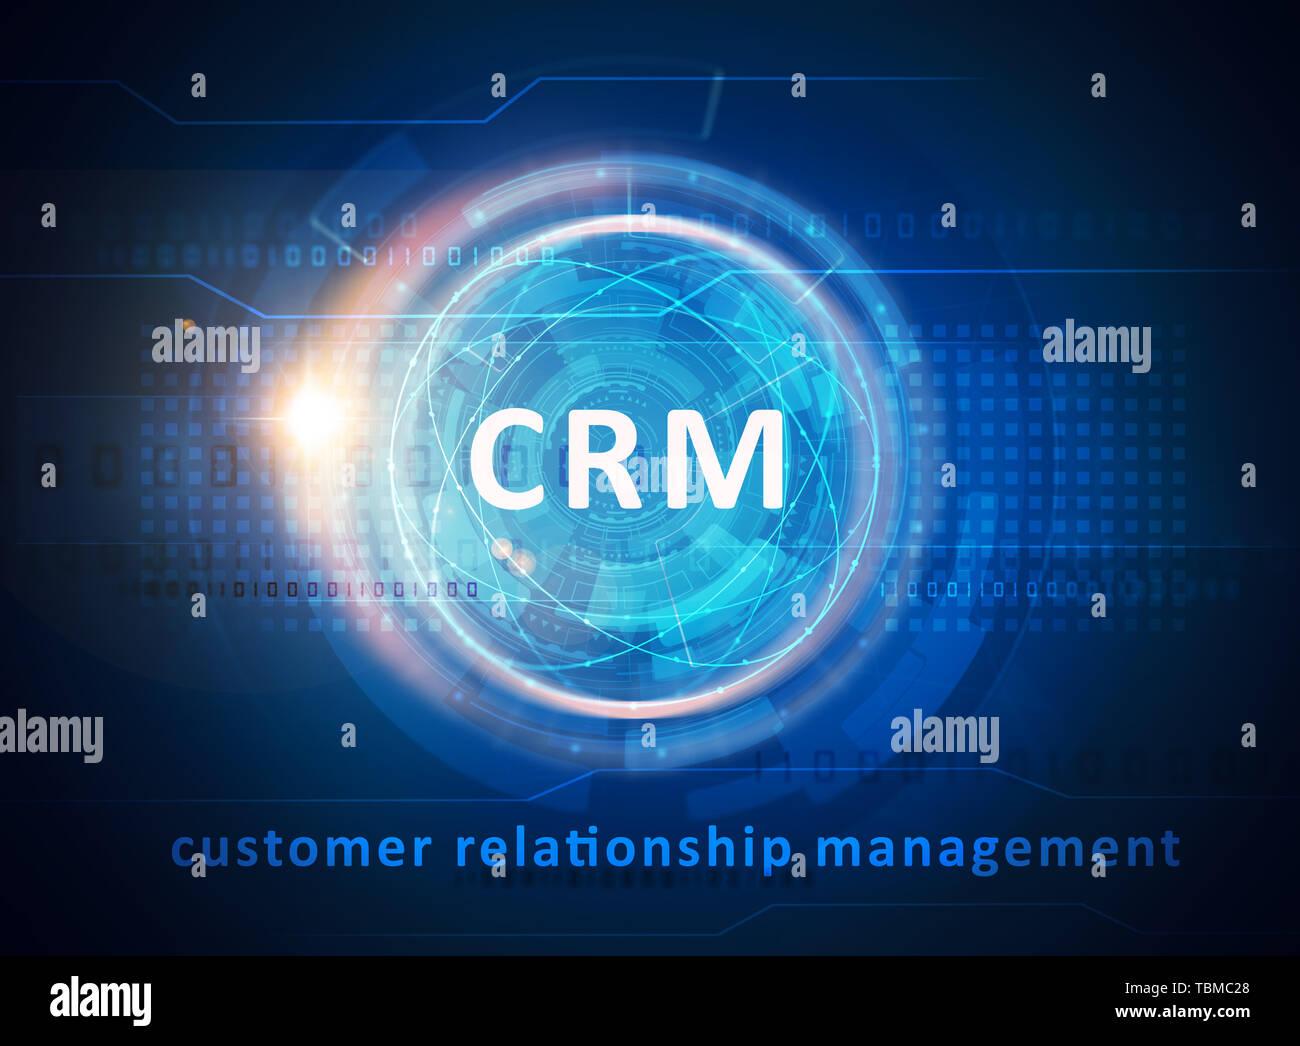 CRM Customer relationship management concept. CRM over blue technology background. - Stock Image